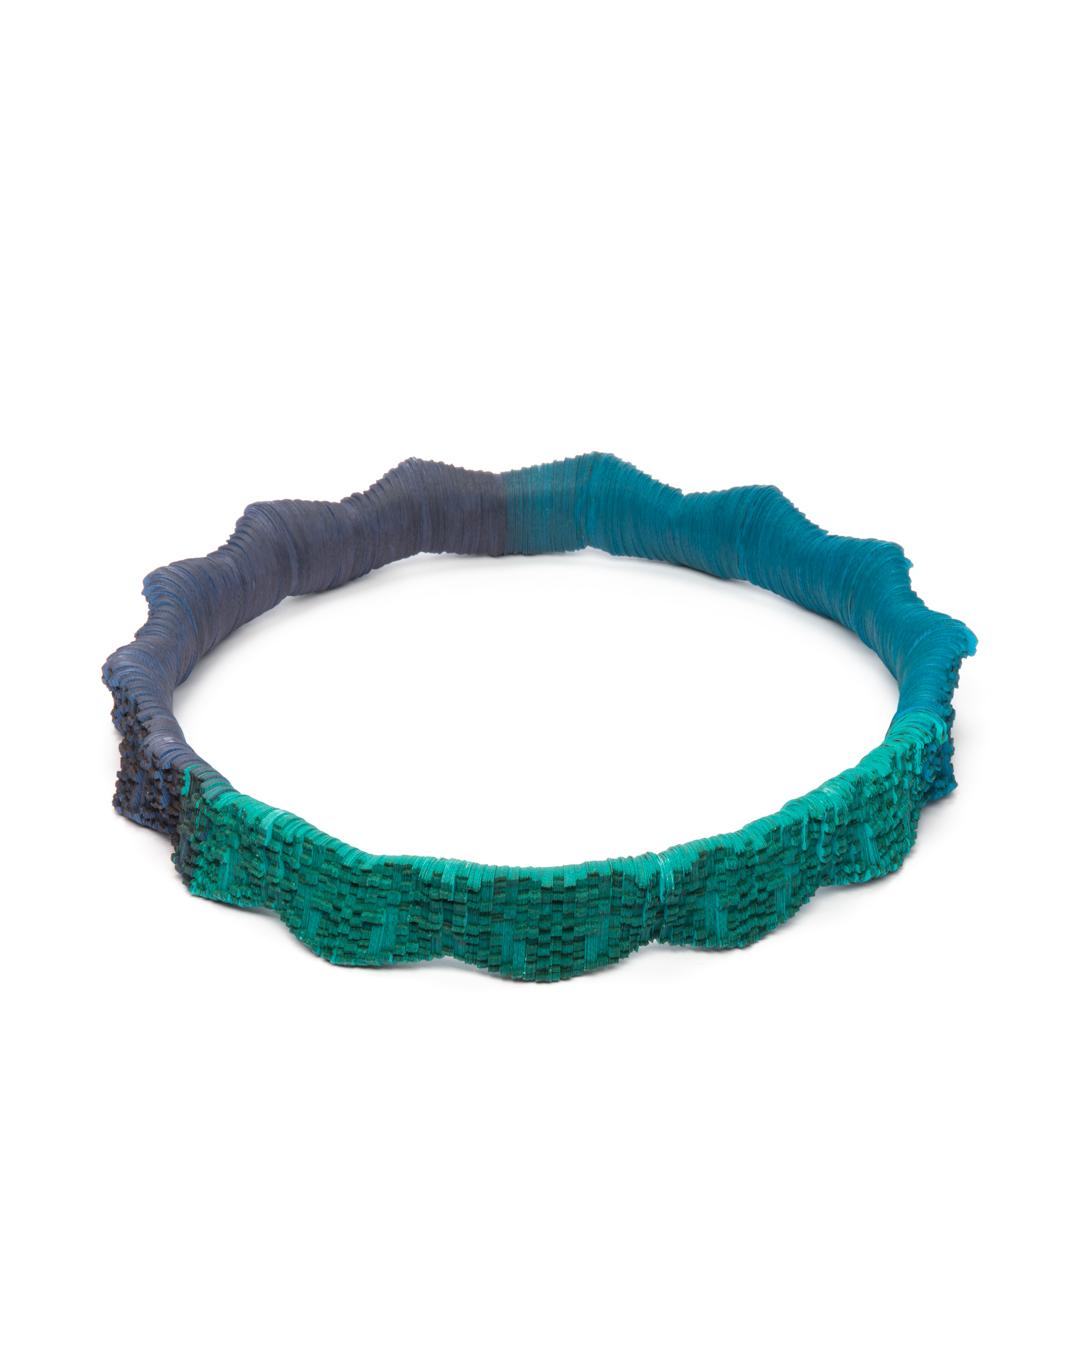 Genevieve Howard, Sassy's Blues, 2020, neckpiece, Japanese linen paper, elastic cord, 280 x 280 x 50 mm  € 2675